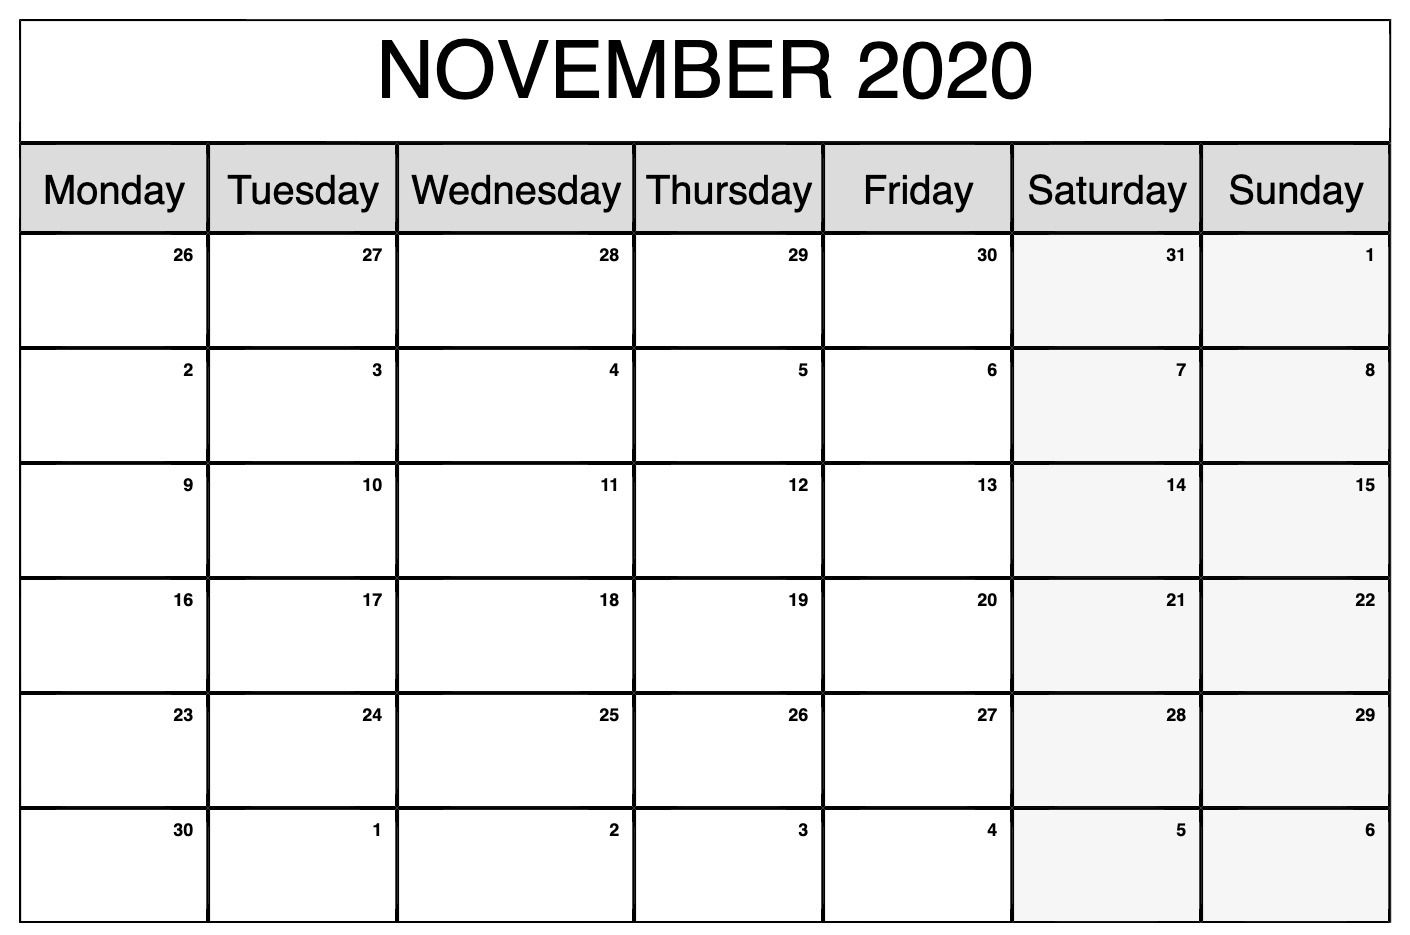 November Calendar 2020 Printable.Printable November 2020 Calendar November Calendar Blank